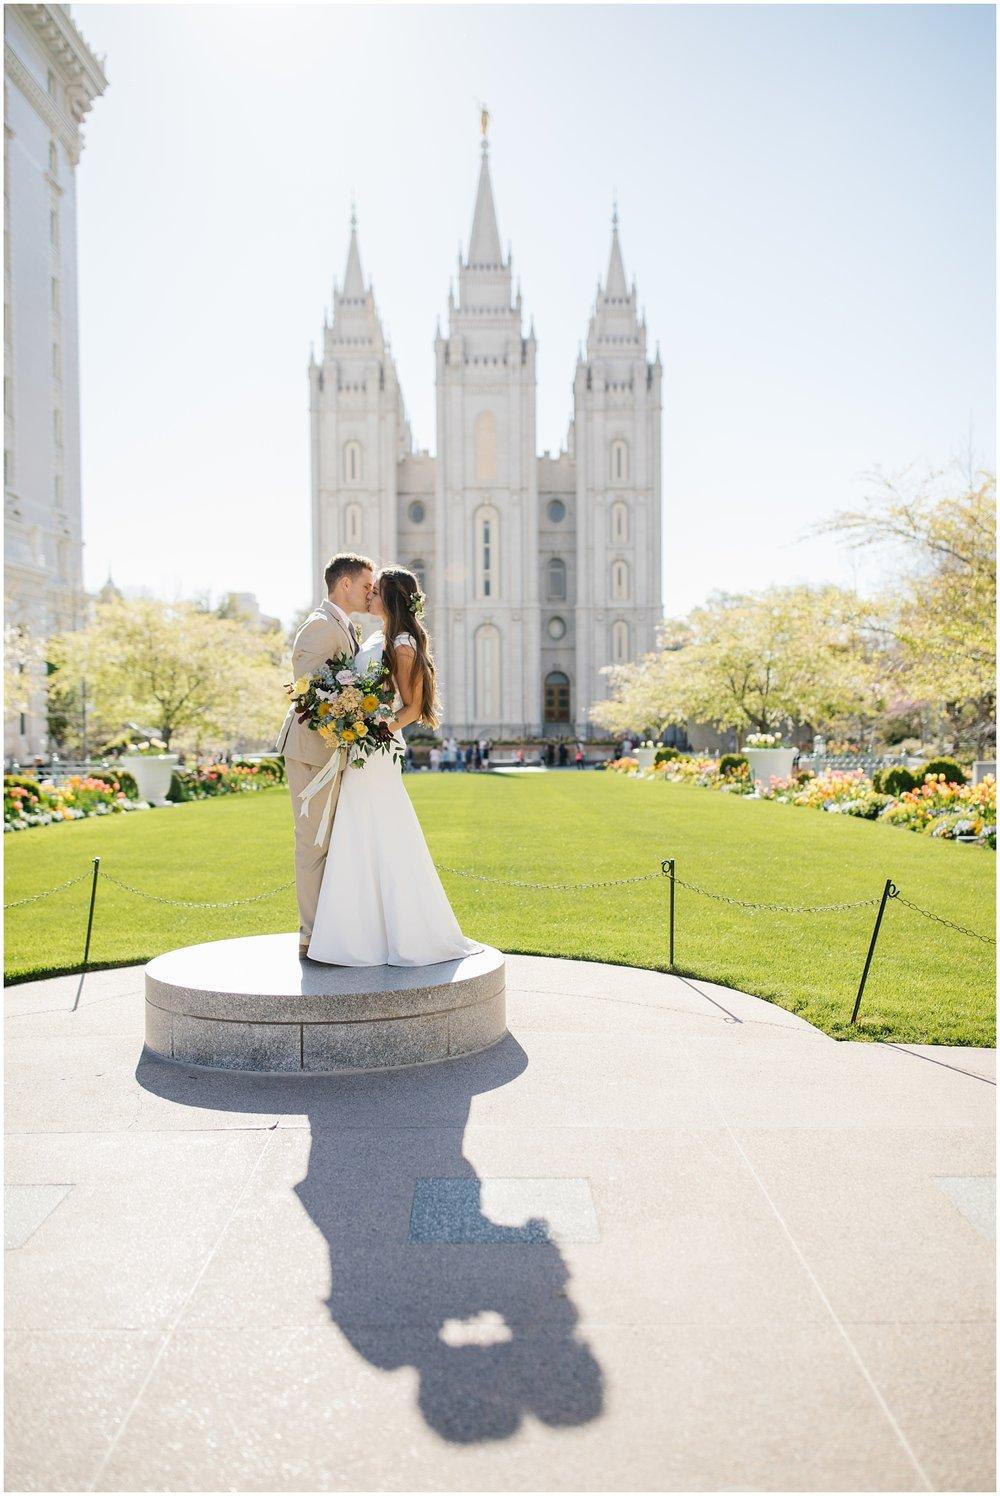 JC-Wedding-217_Lizzie-B-Imagery-Utah-Wedding-Photographer-Park-City-Salt-Lake-City-Temple-Joseph-Smith-Memorial-Building-Empire-Room.jpg